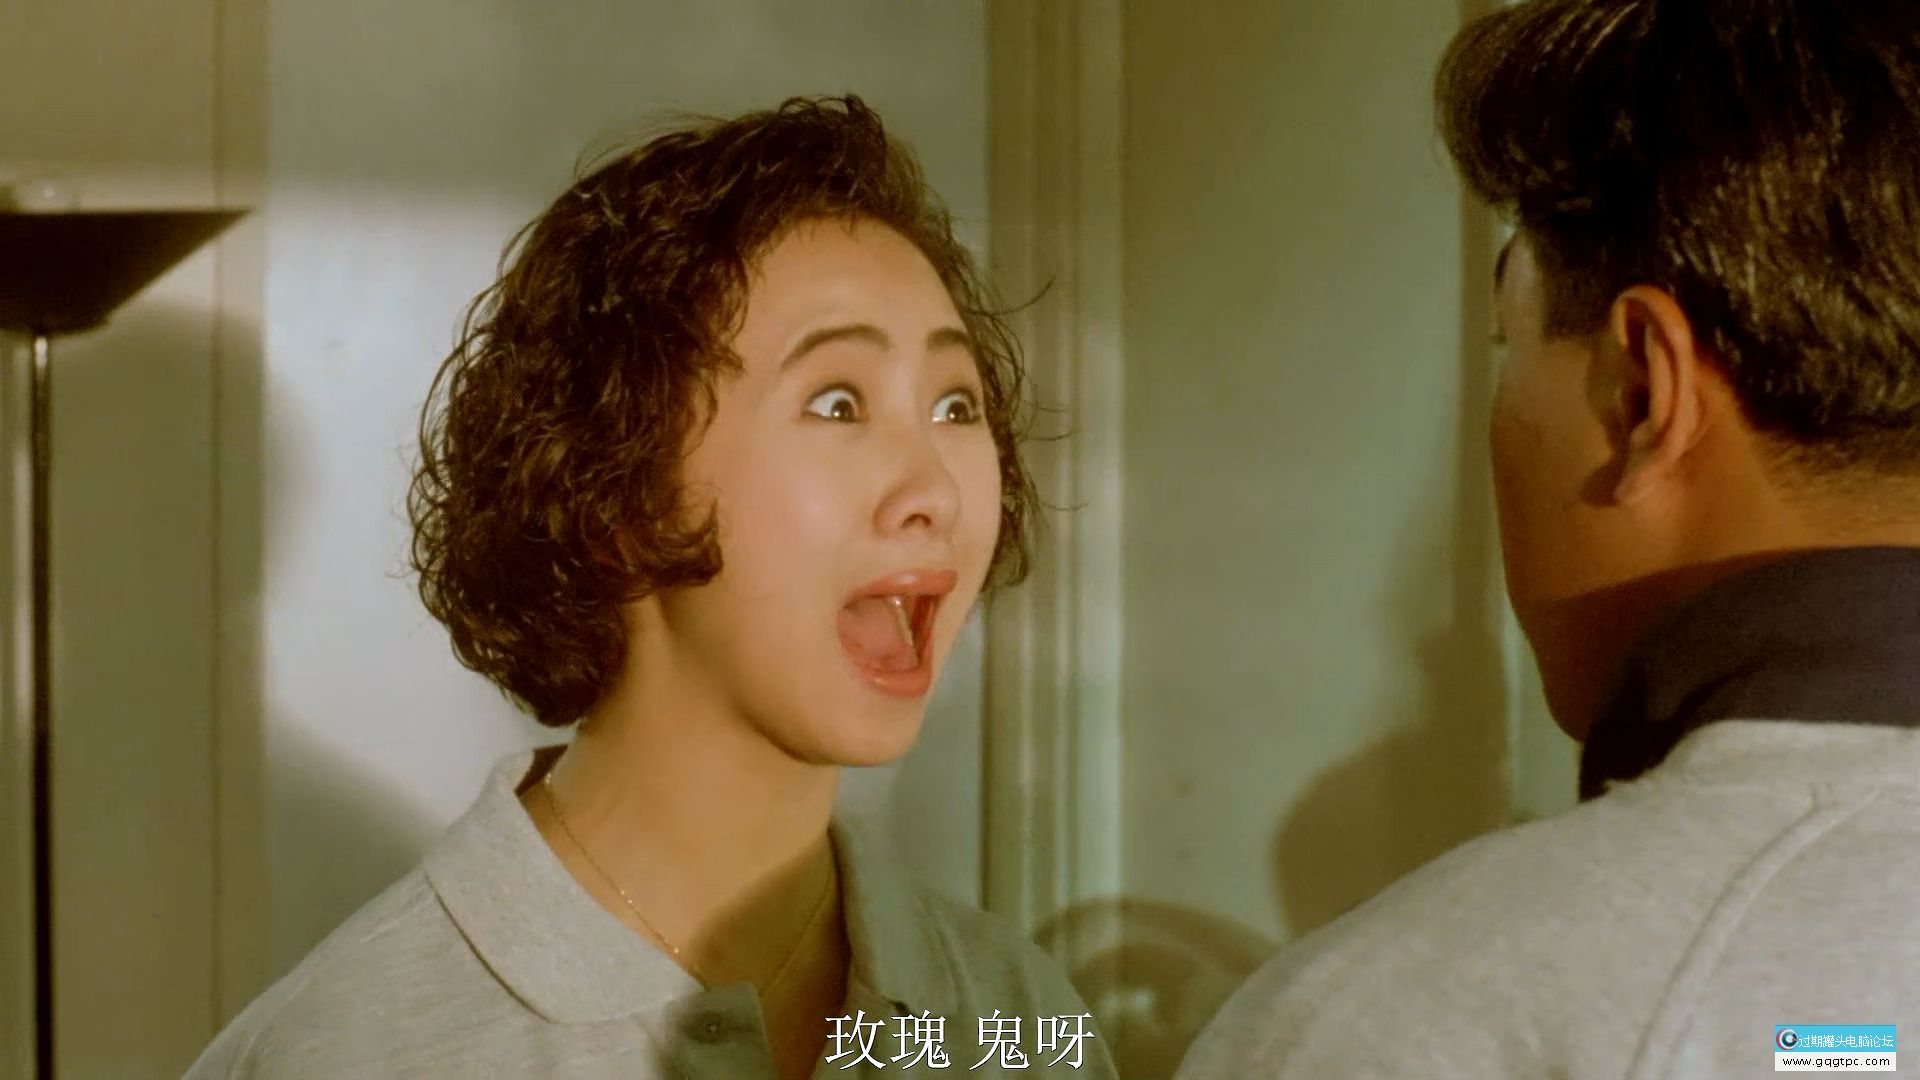 Z..My.Pale.Lover.1993.WEB-DL.1080P.x265.10bit.AAC.Cantonese.CHT-FFansWEB.mp4_20171225_124656.571d6d6b.jpg